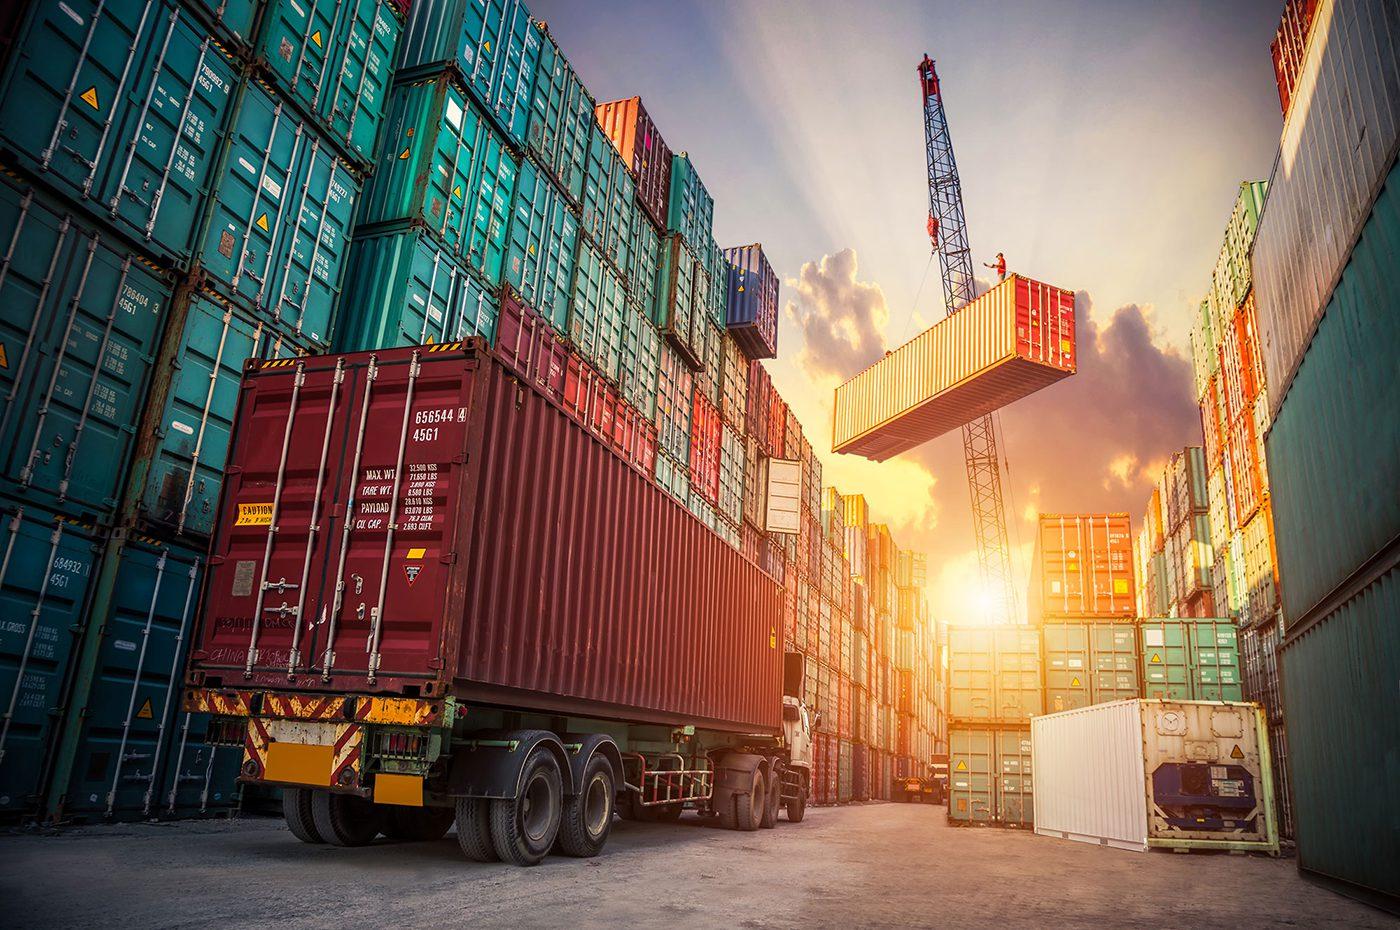 Crane lifting container